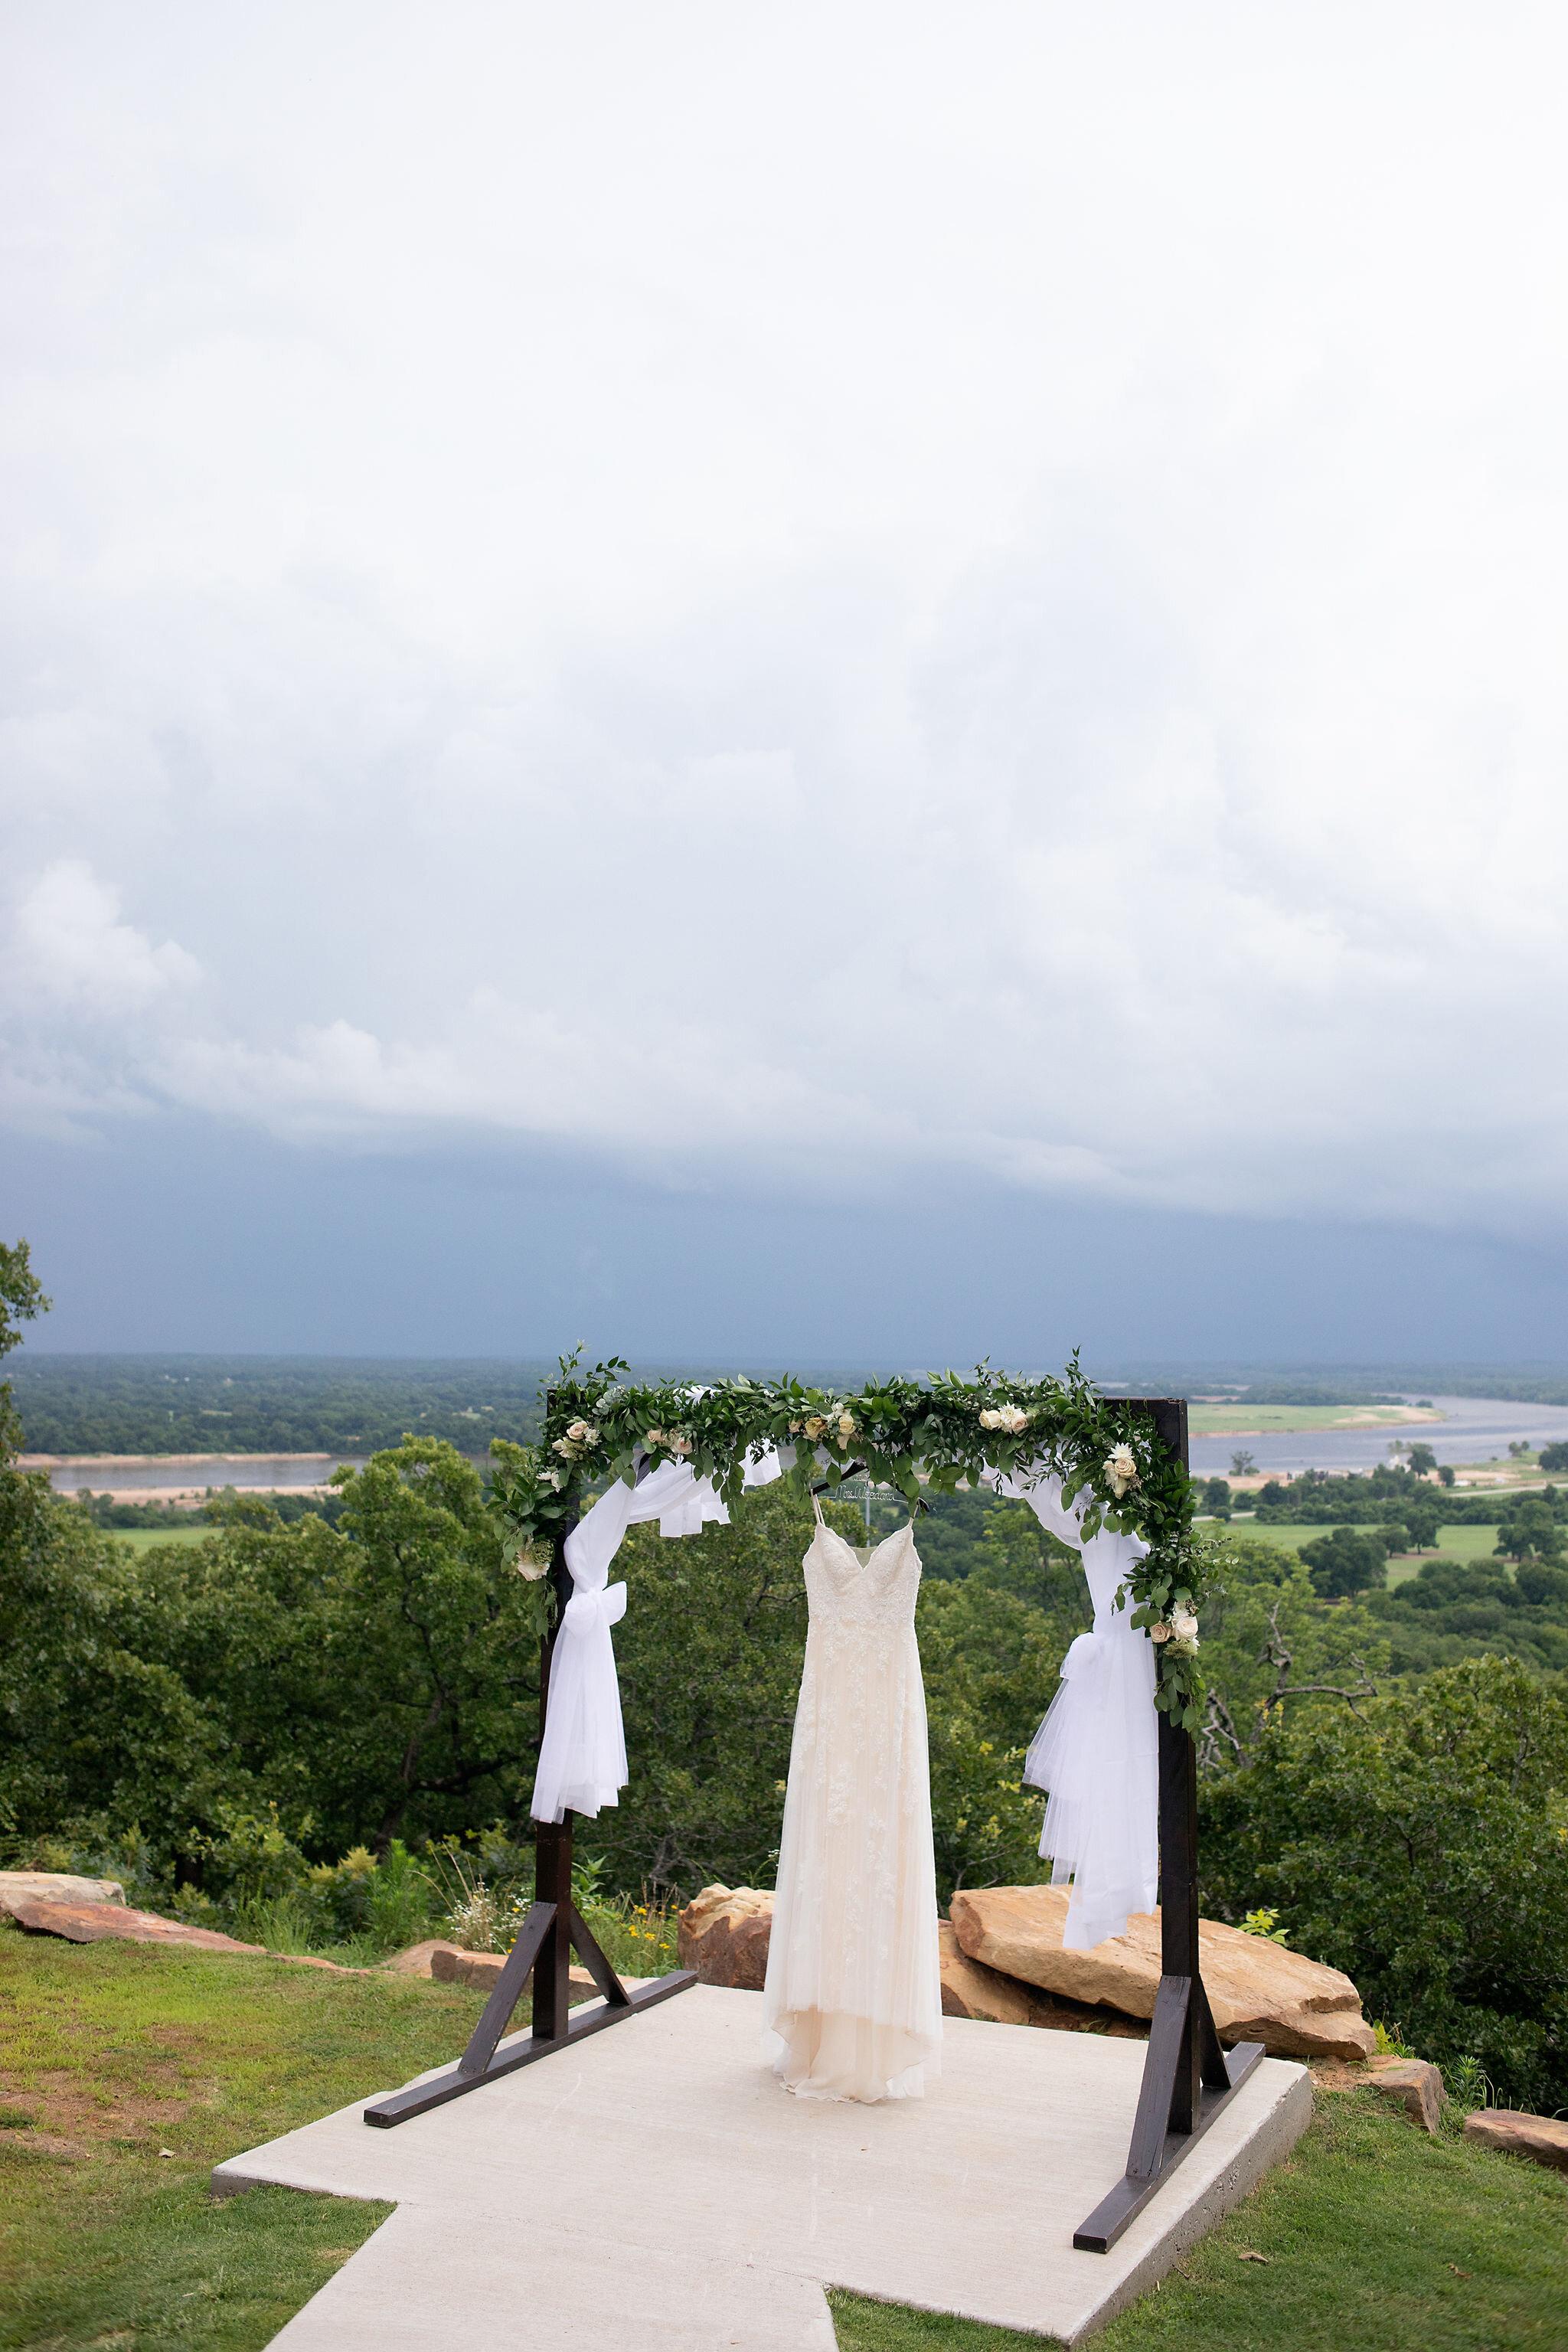 Oklahoma Summer Wedding Venue Dream Point Ranch 1a.jpg